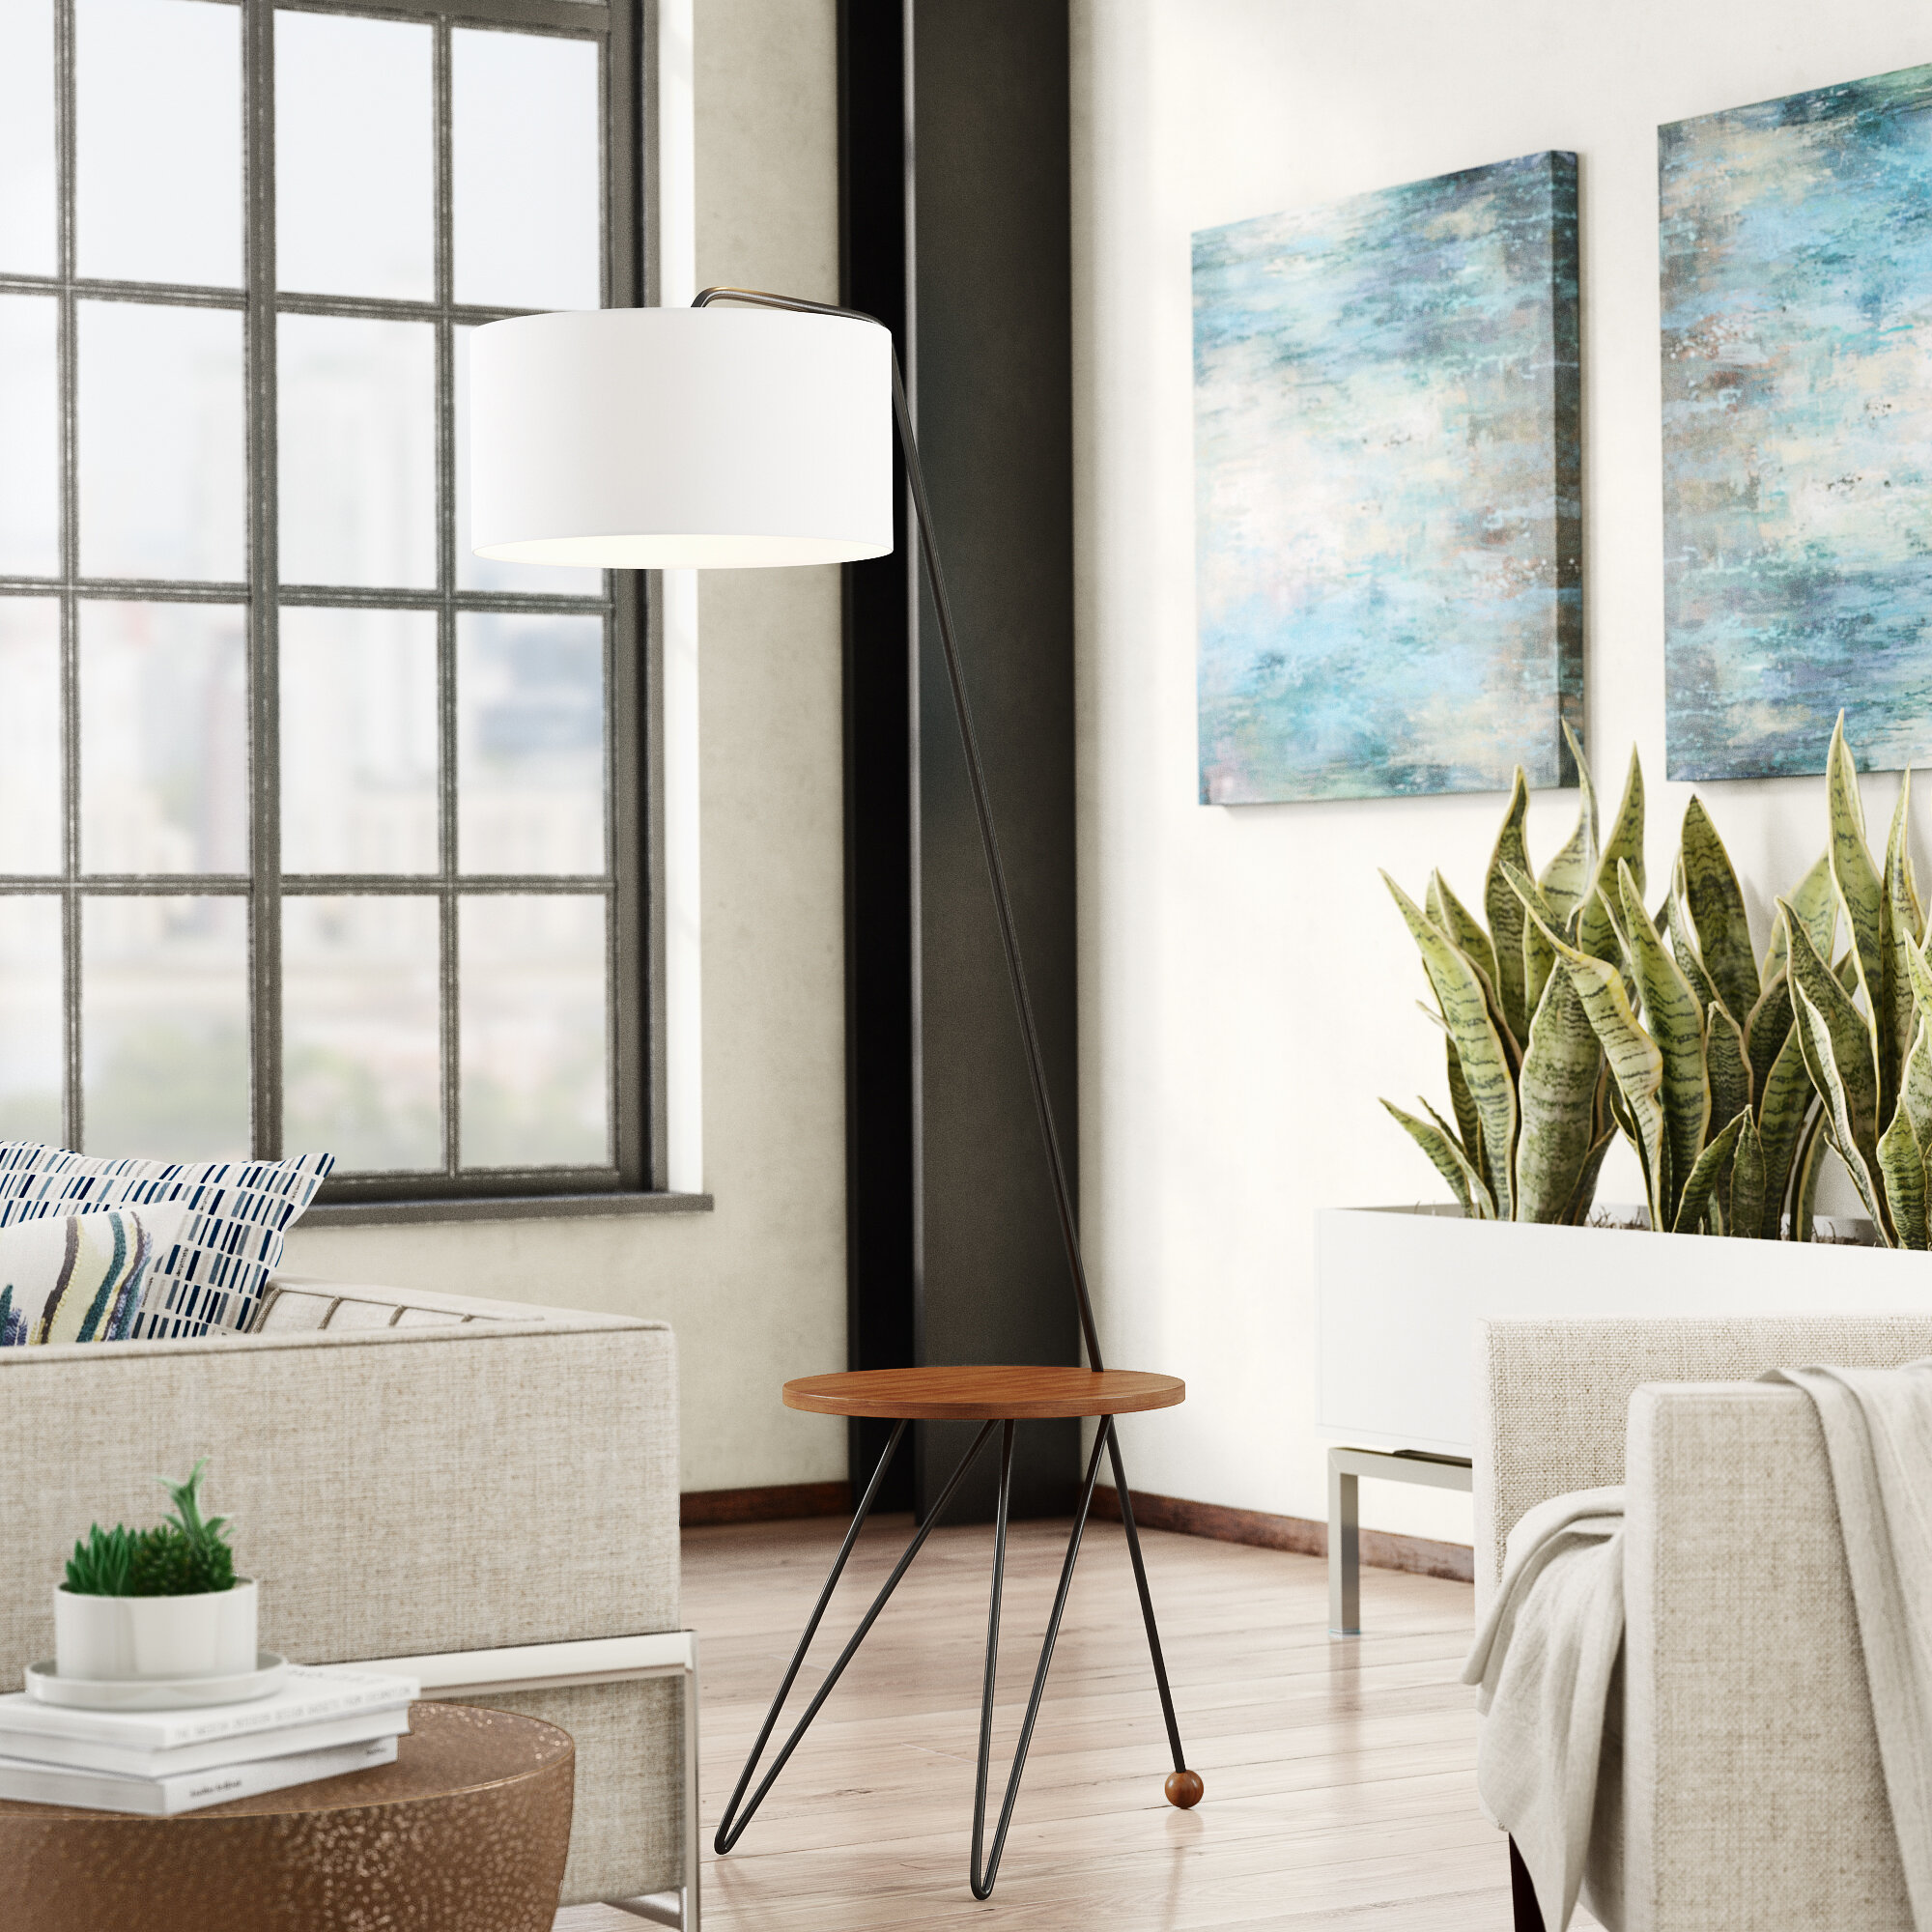 Superb Koppel 70 Arched Floor Lamp Home Interior And Landscaping Pimpapssignezvosmurscom